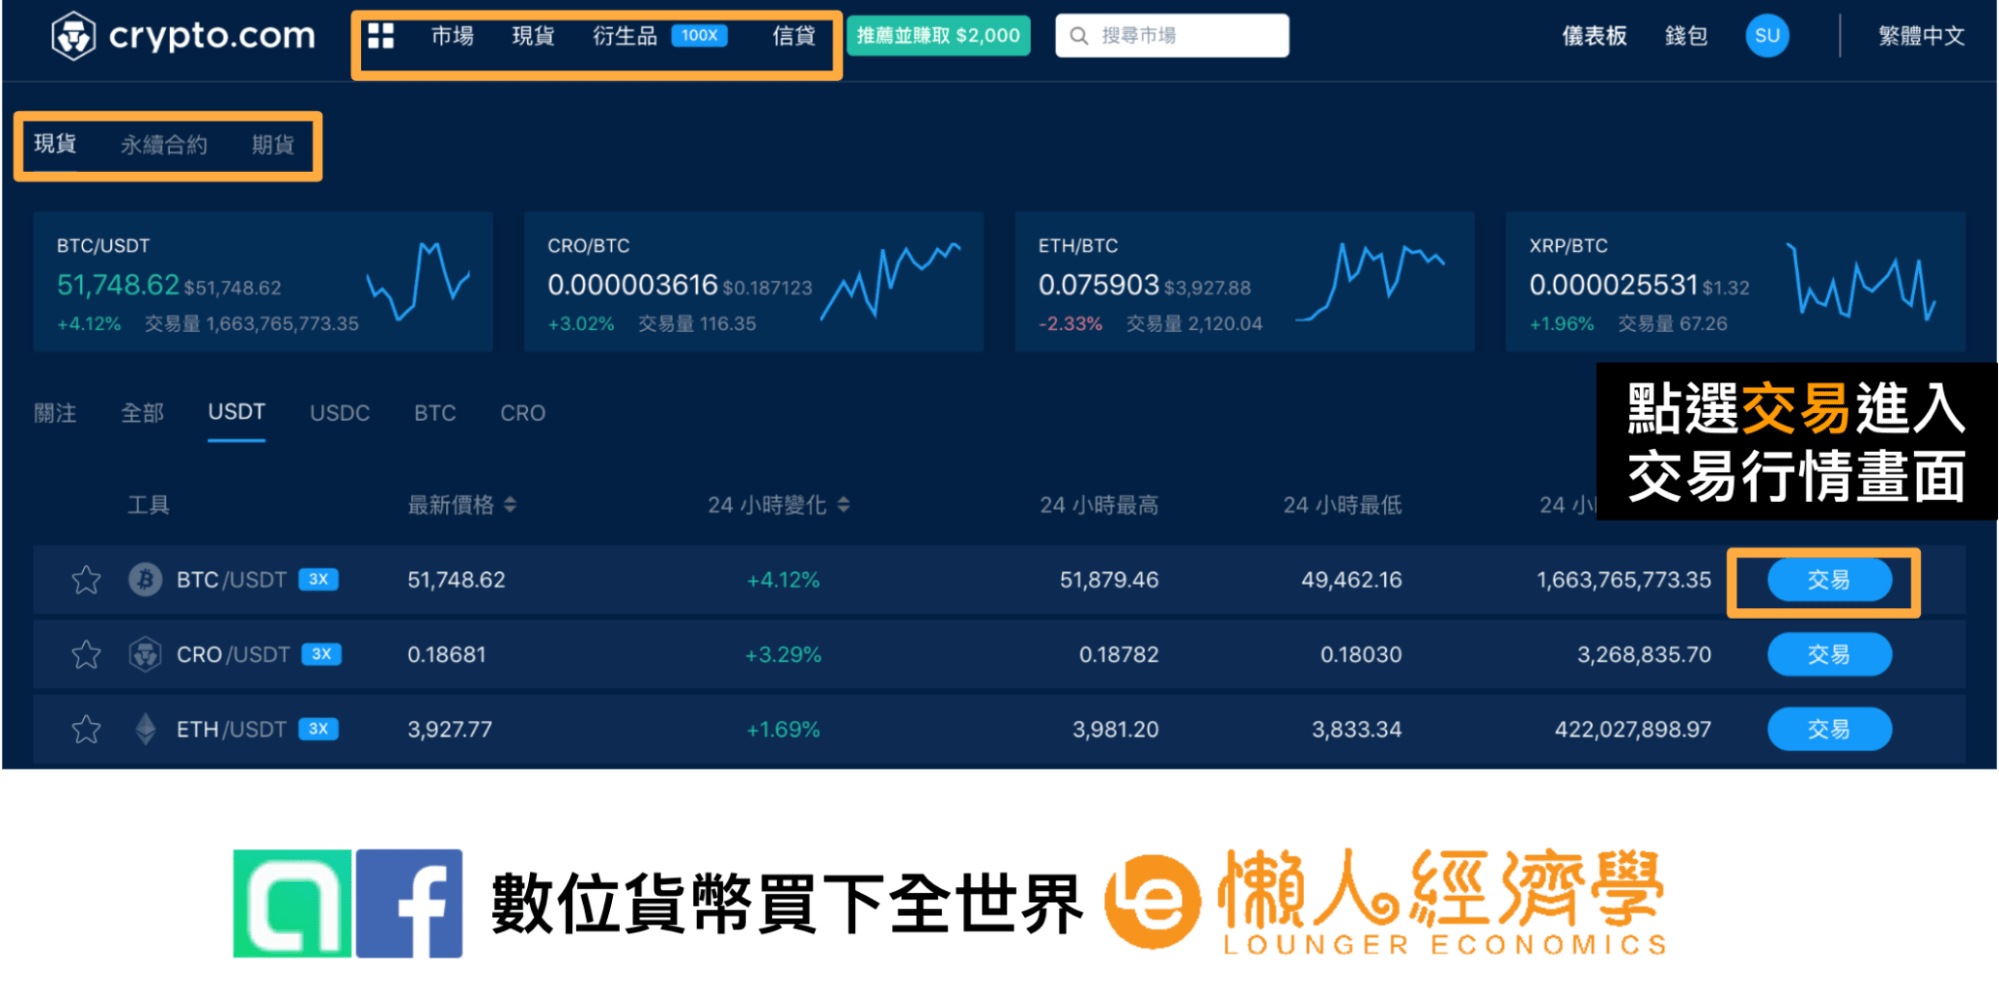 Crypto.com交易所頁面操作介紹1